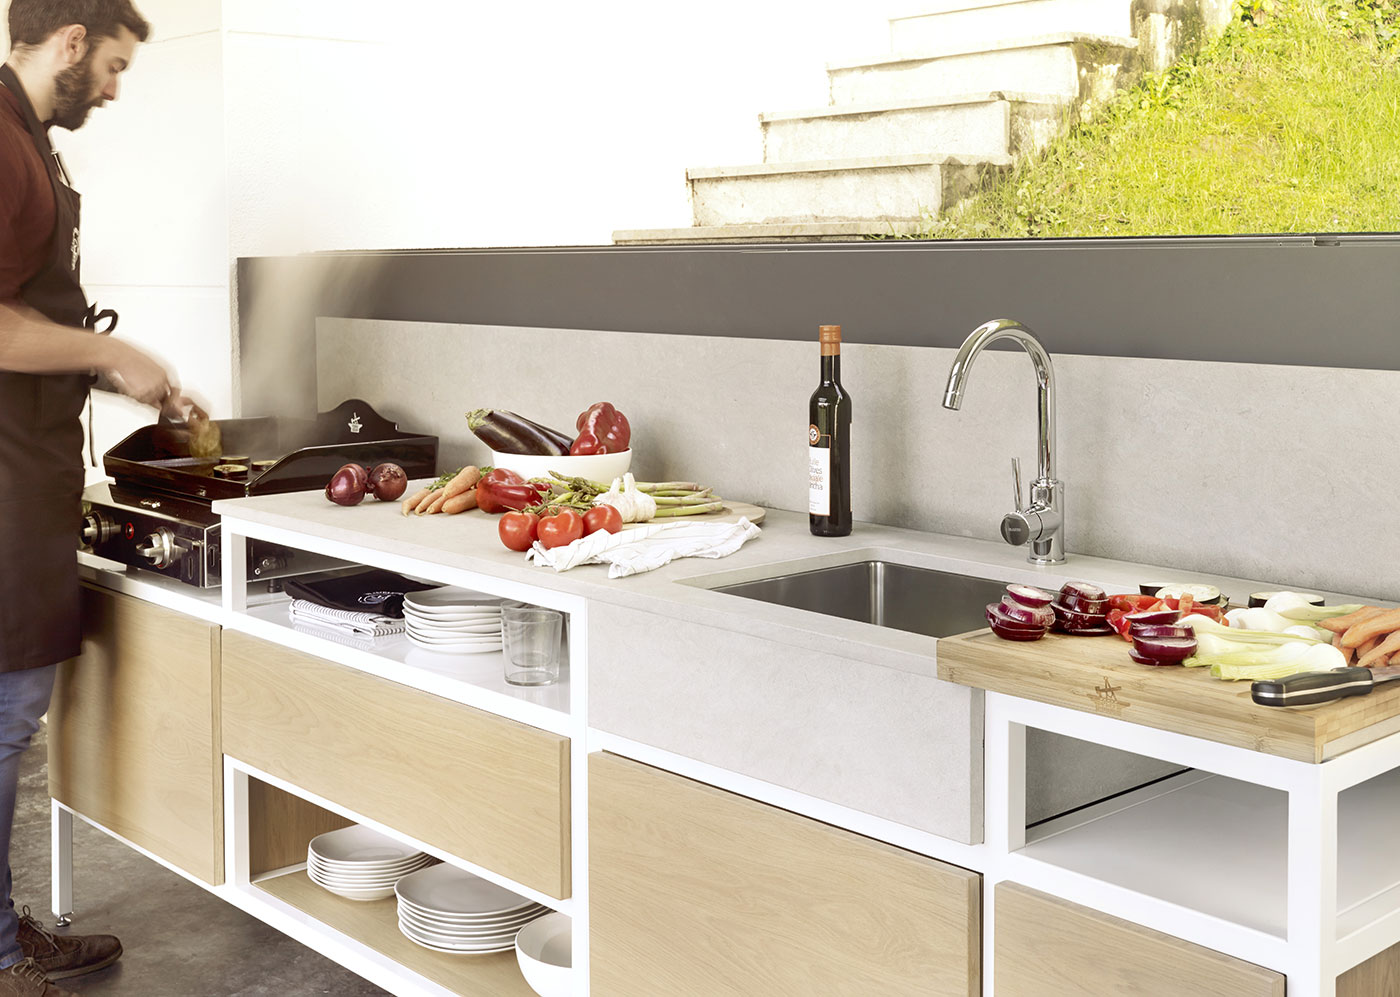 cuisine ext rieure design. Black Bedroom Furniture Sets. Home Design Ideas